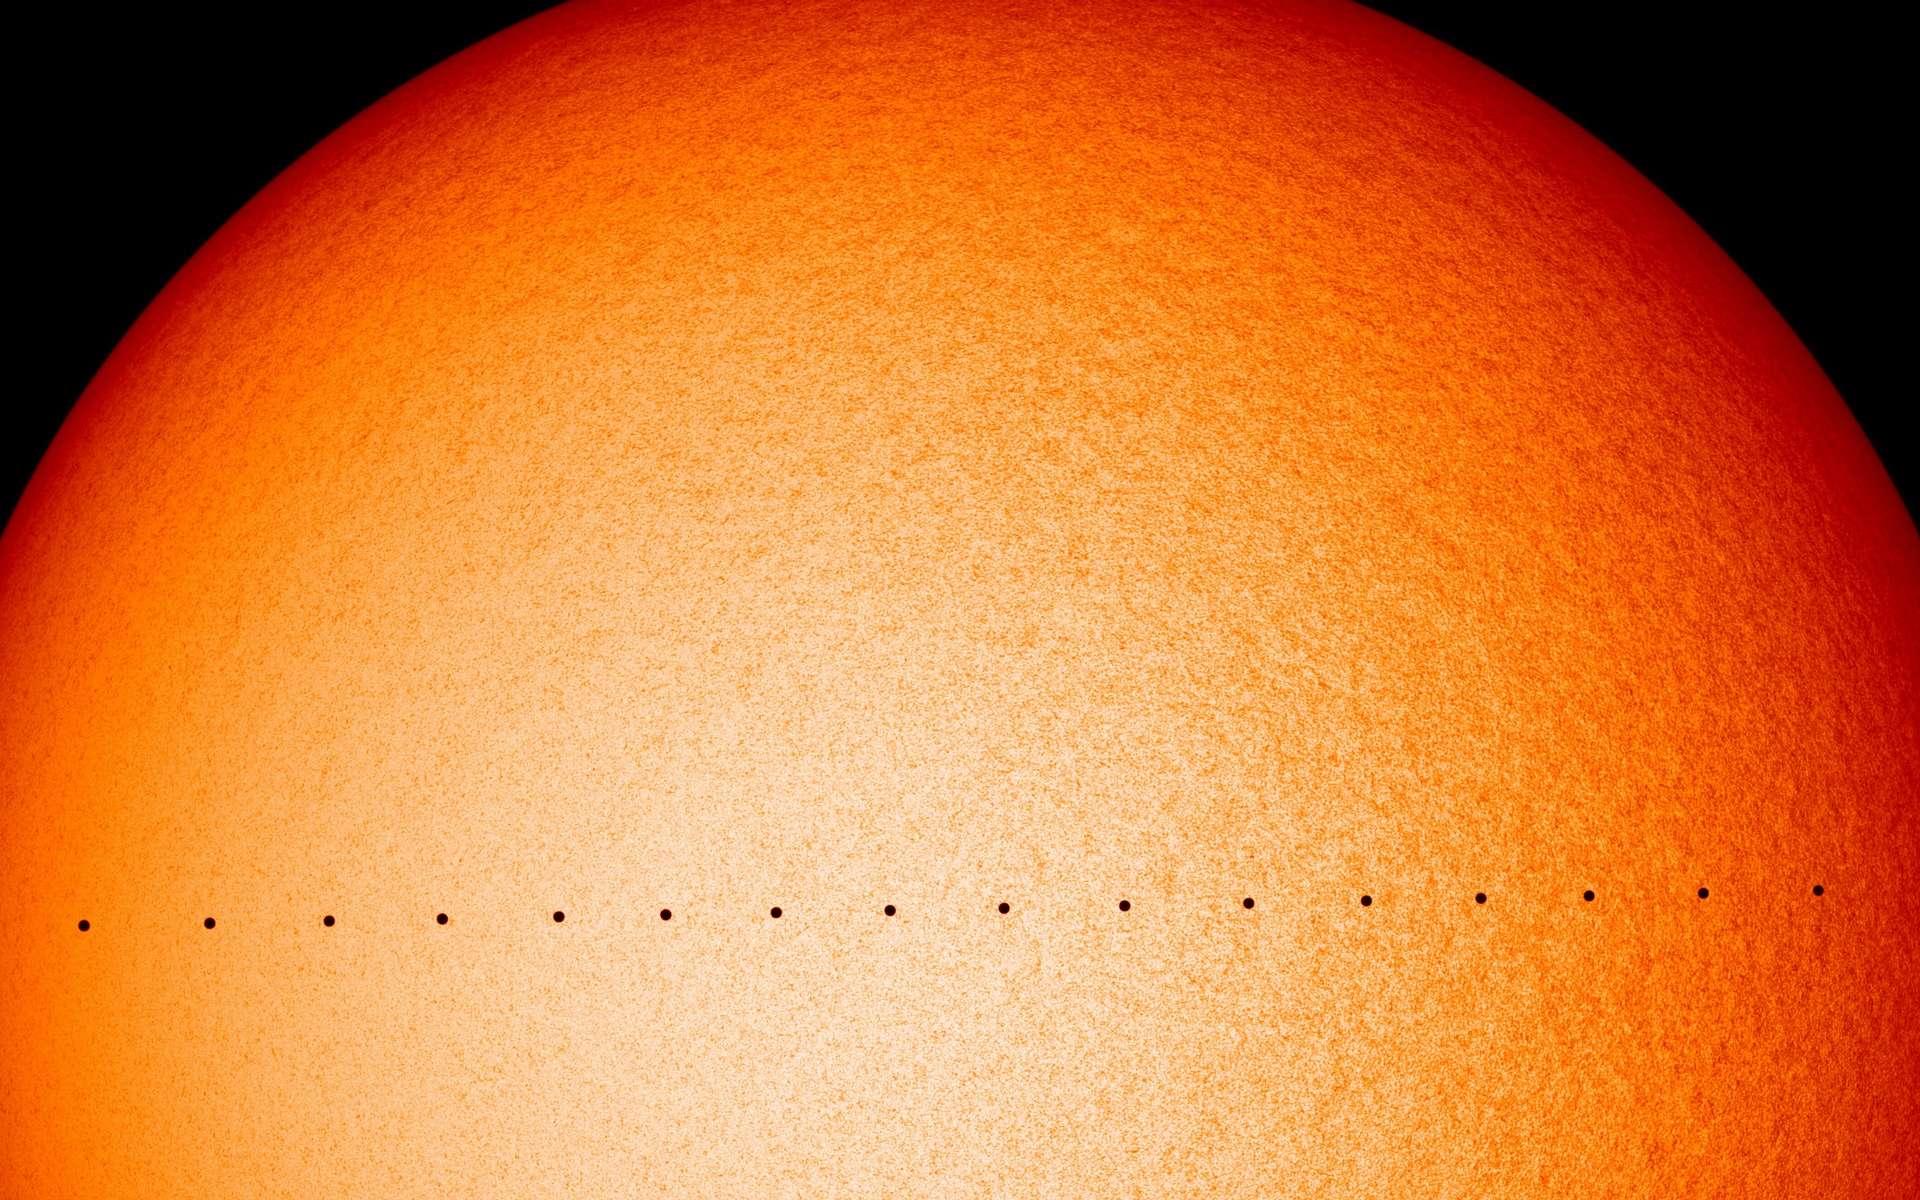 Mercure devant le Soleil le 11 novembre 2019. © Nasa, SDO